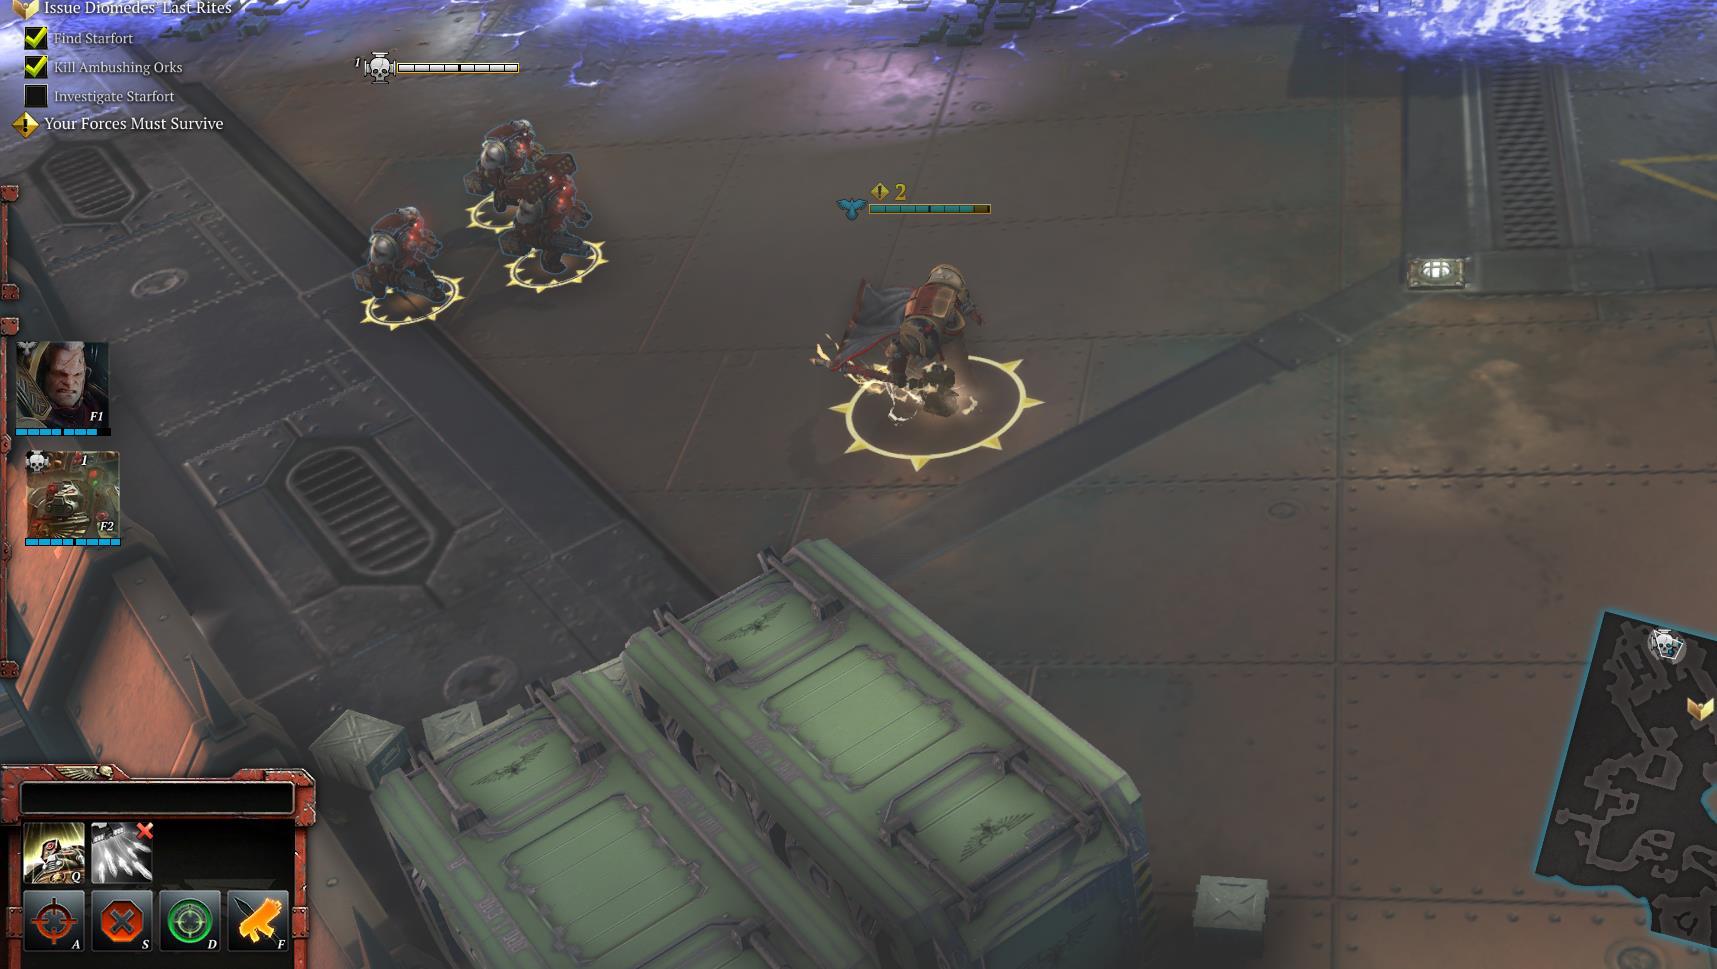 dawn_of_war_3_in_game_gabriel_overhead_1